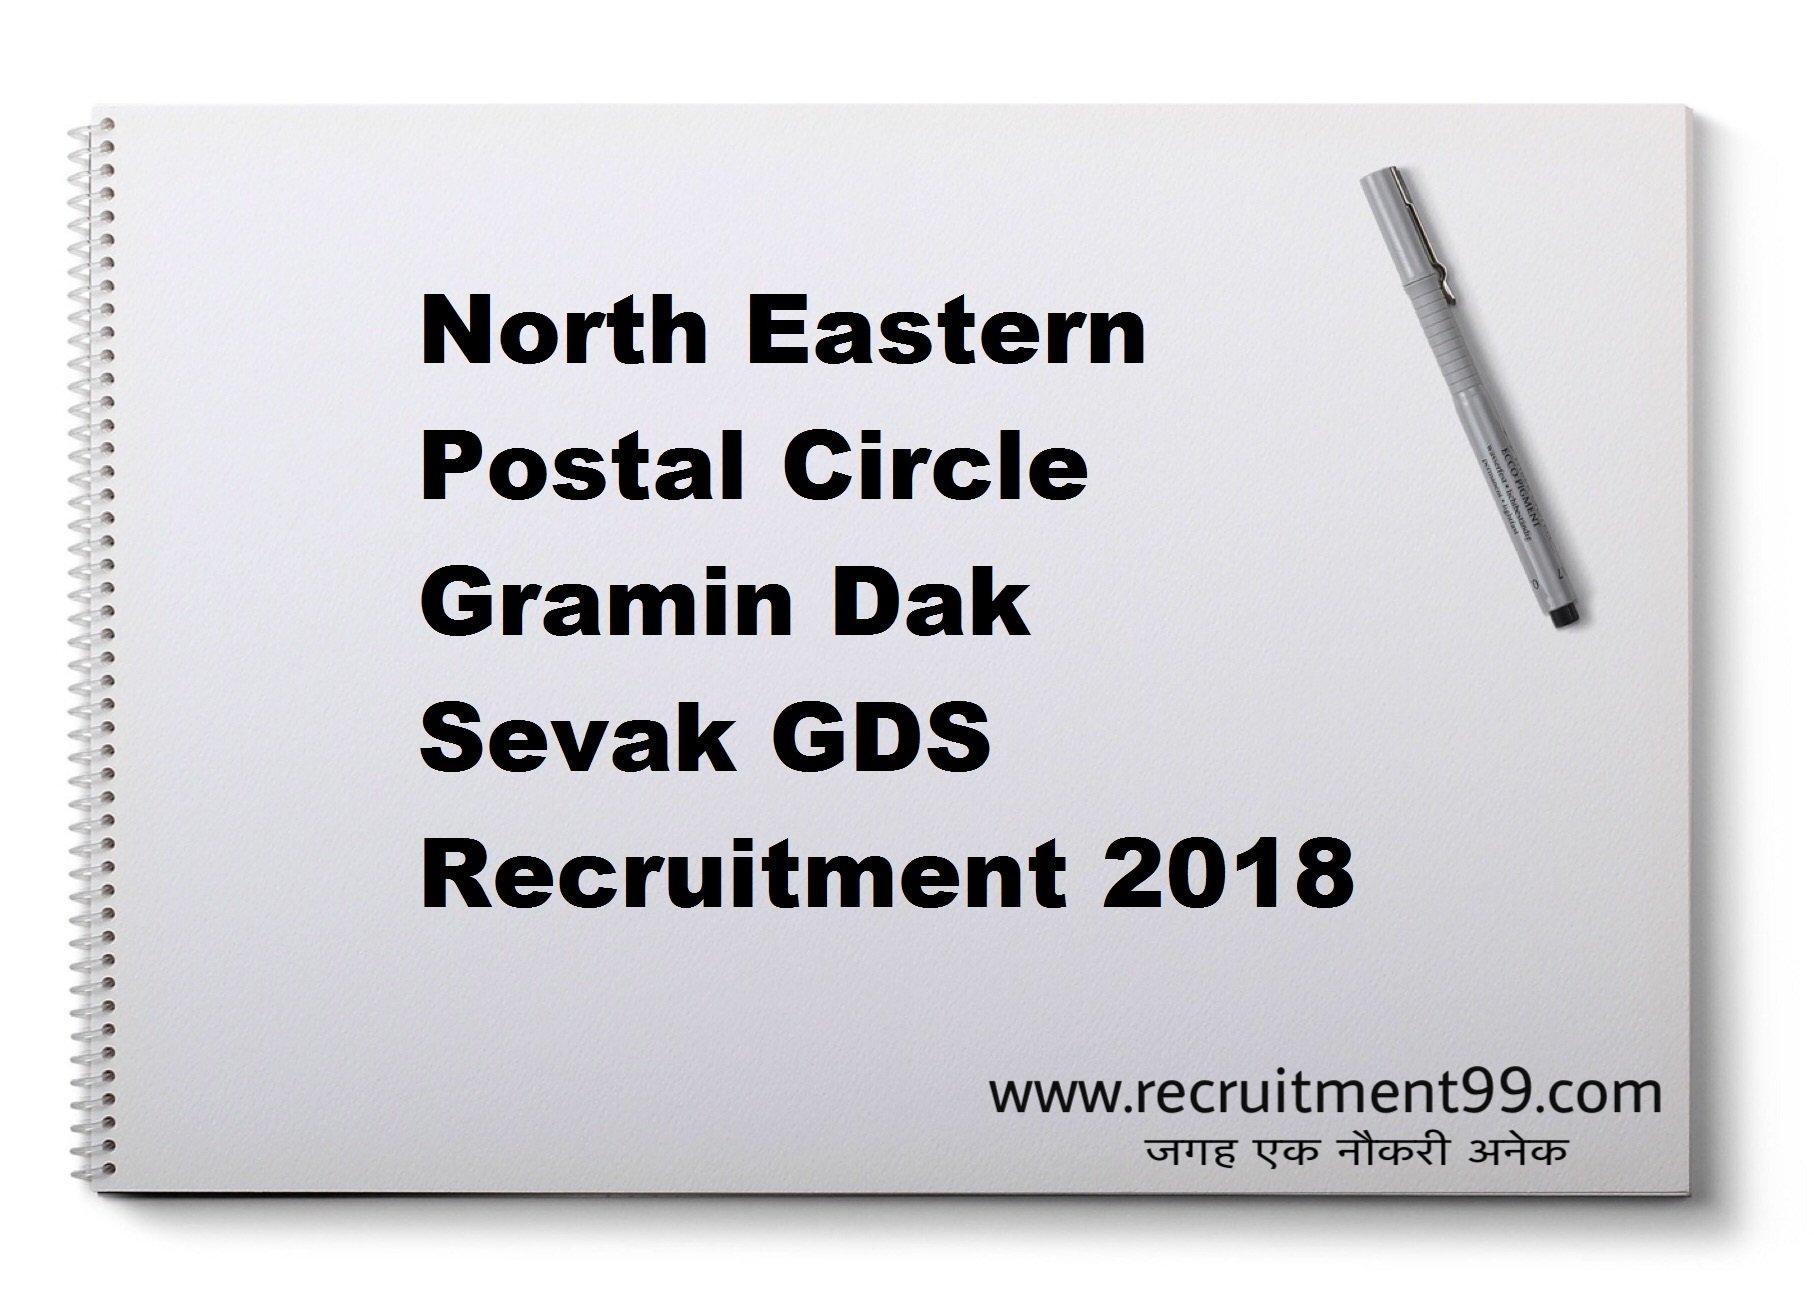 North Eastern Postal Circle Gramin Dak Sevak GDS Recruitment Admit Card Result 2018